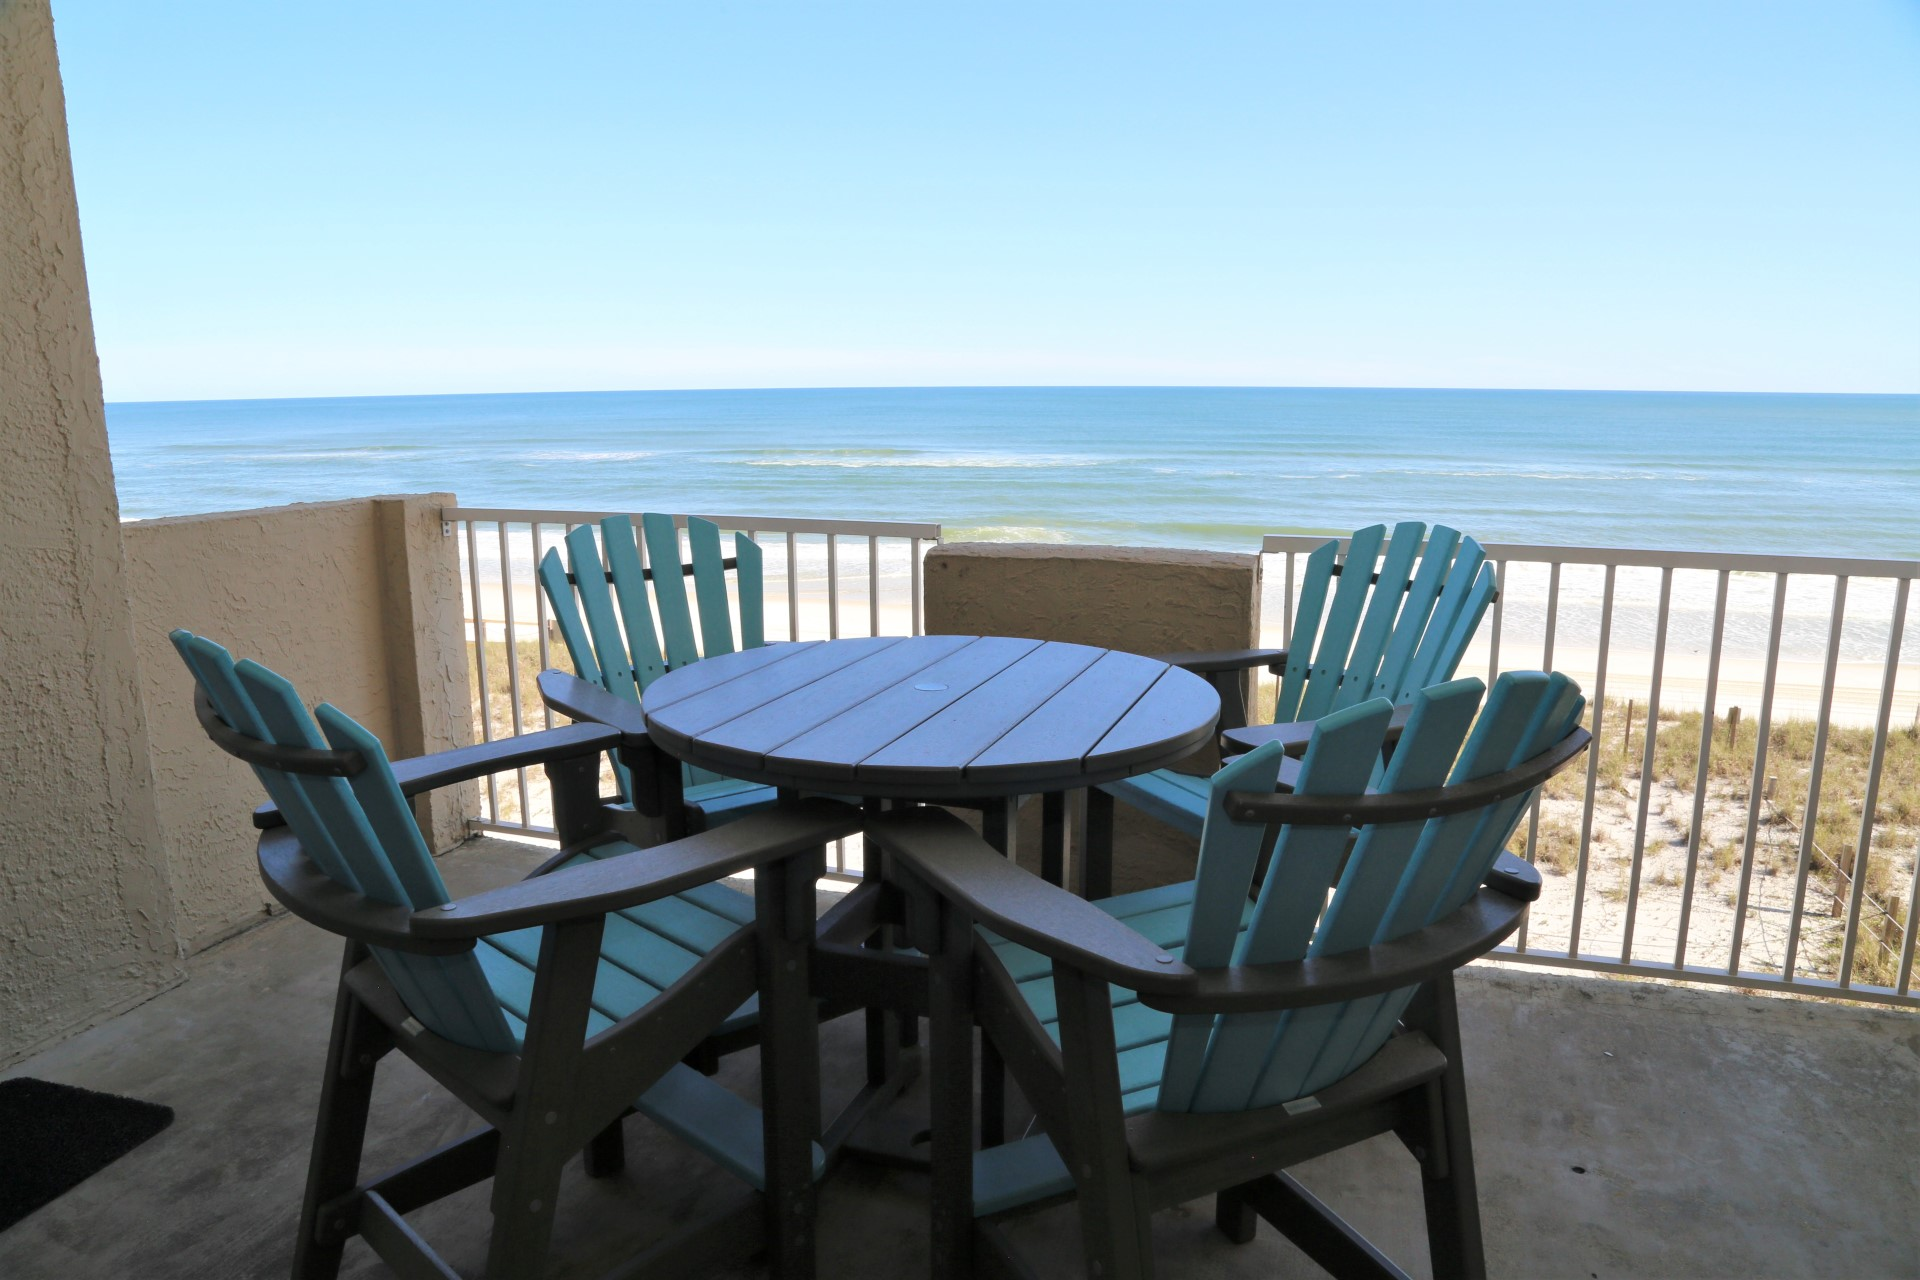 Premium balcony furniture to enjoy the refreshing salt air a